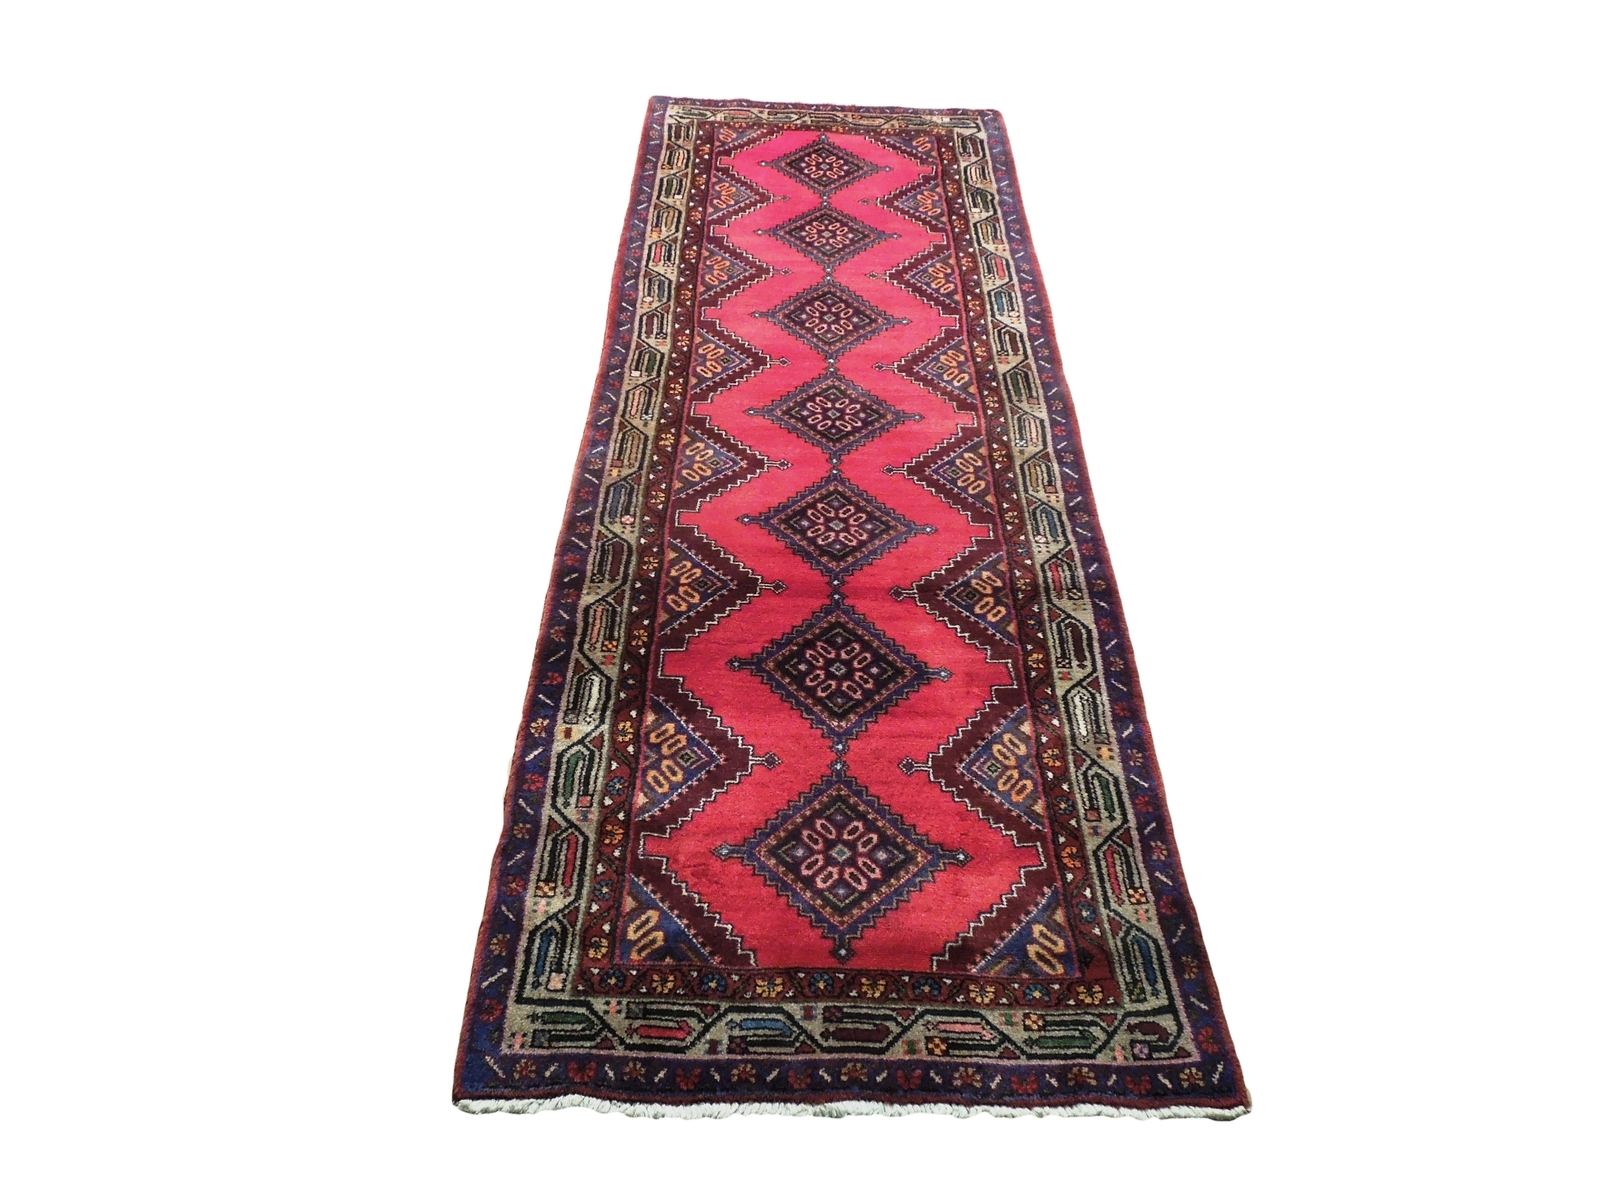 Pink Hamadan Persian Wool Handmade Rug 3x9 All-Over Geometric Rug